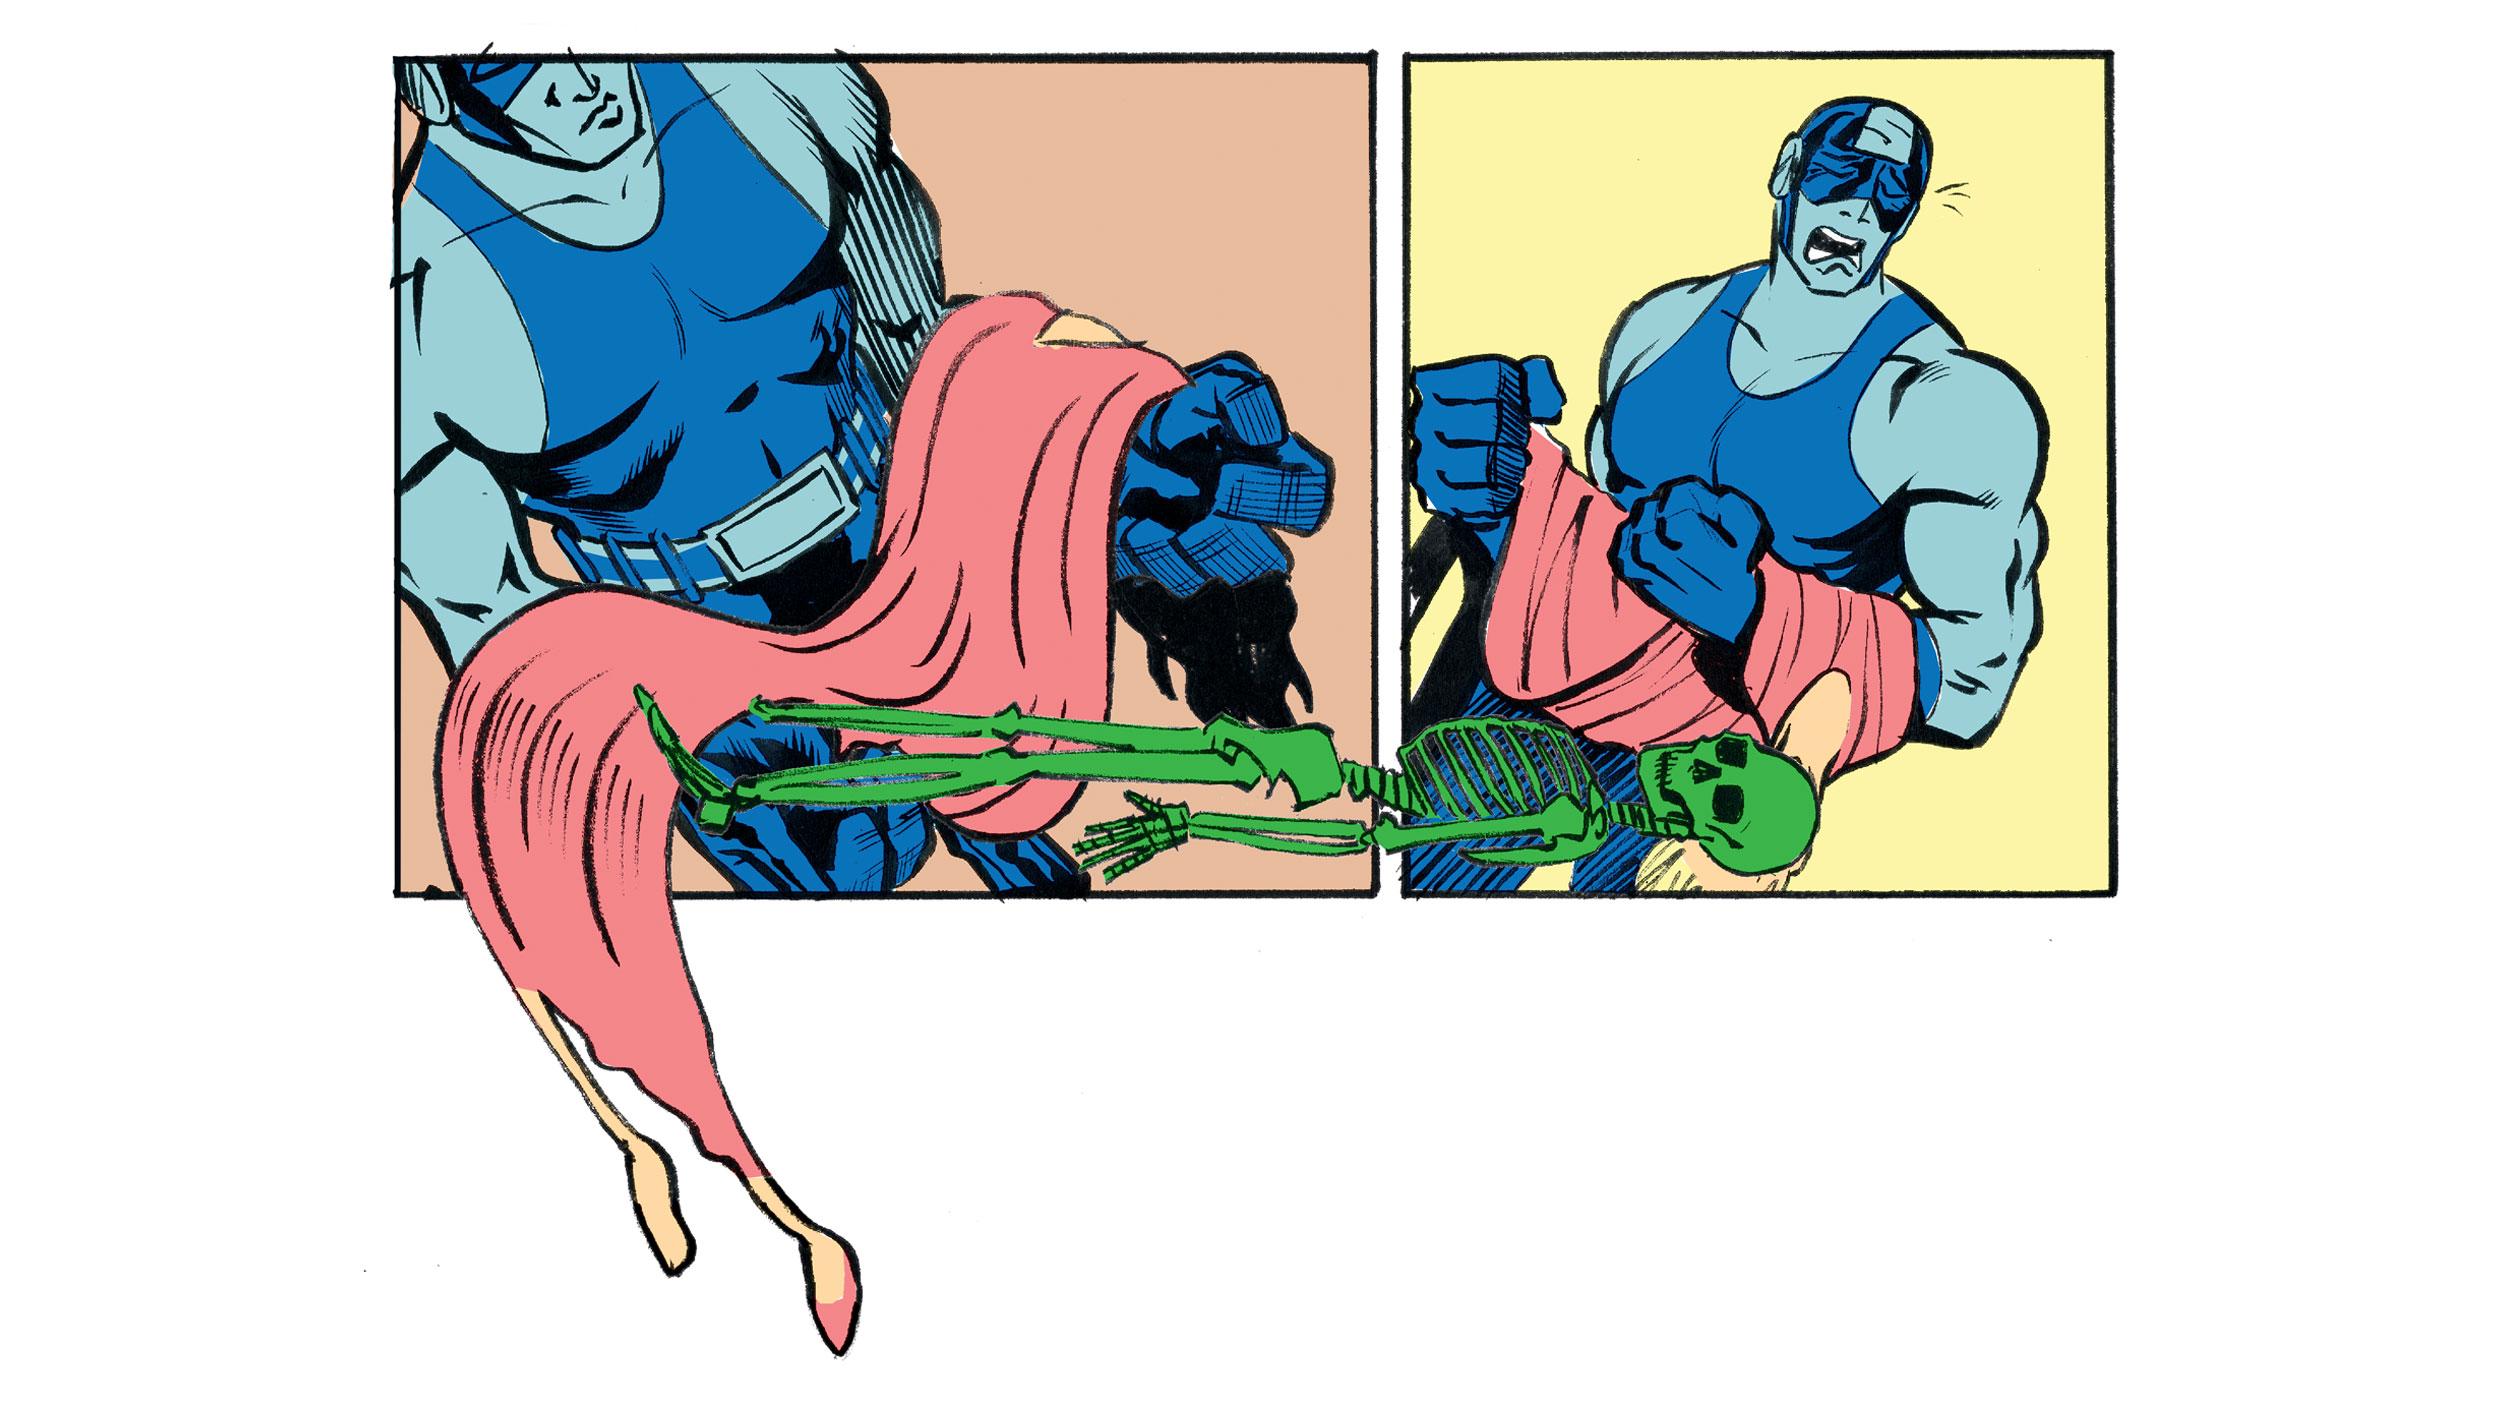 ted-joy-lin-superhero-strength-cognitive-02.jpg